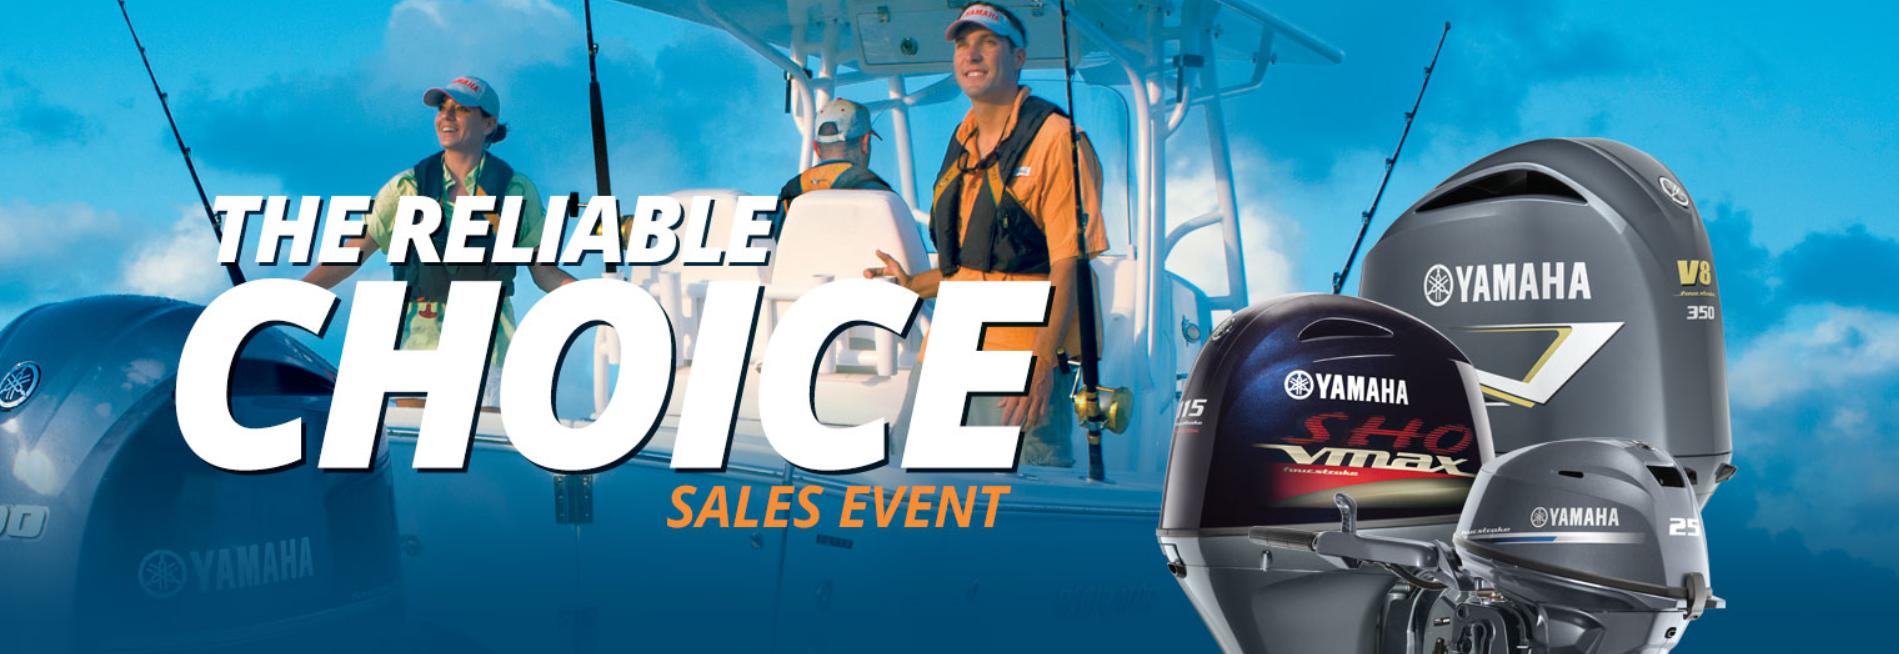 yamaha 2020 sales event